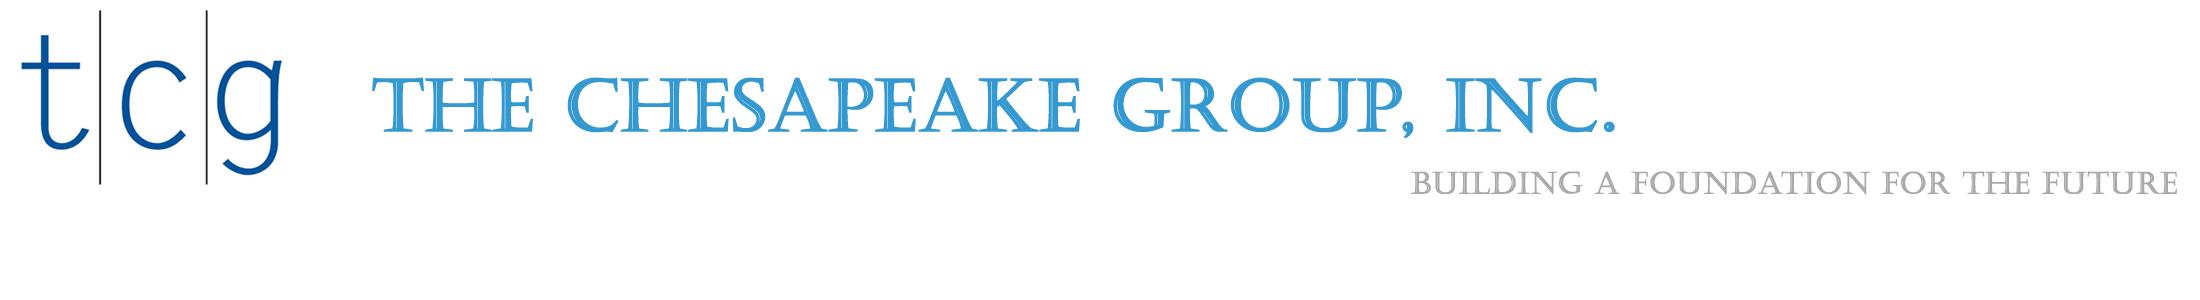 The Chesapeake Group, Inc.